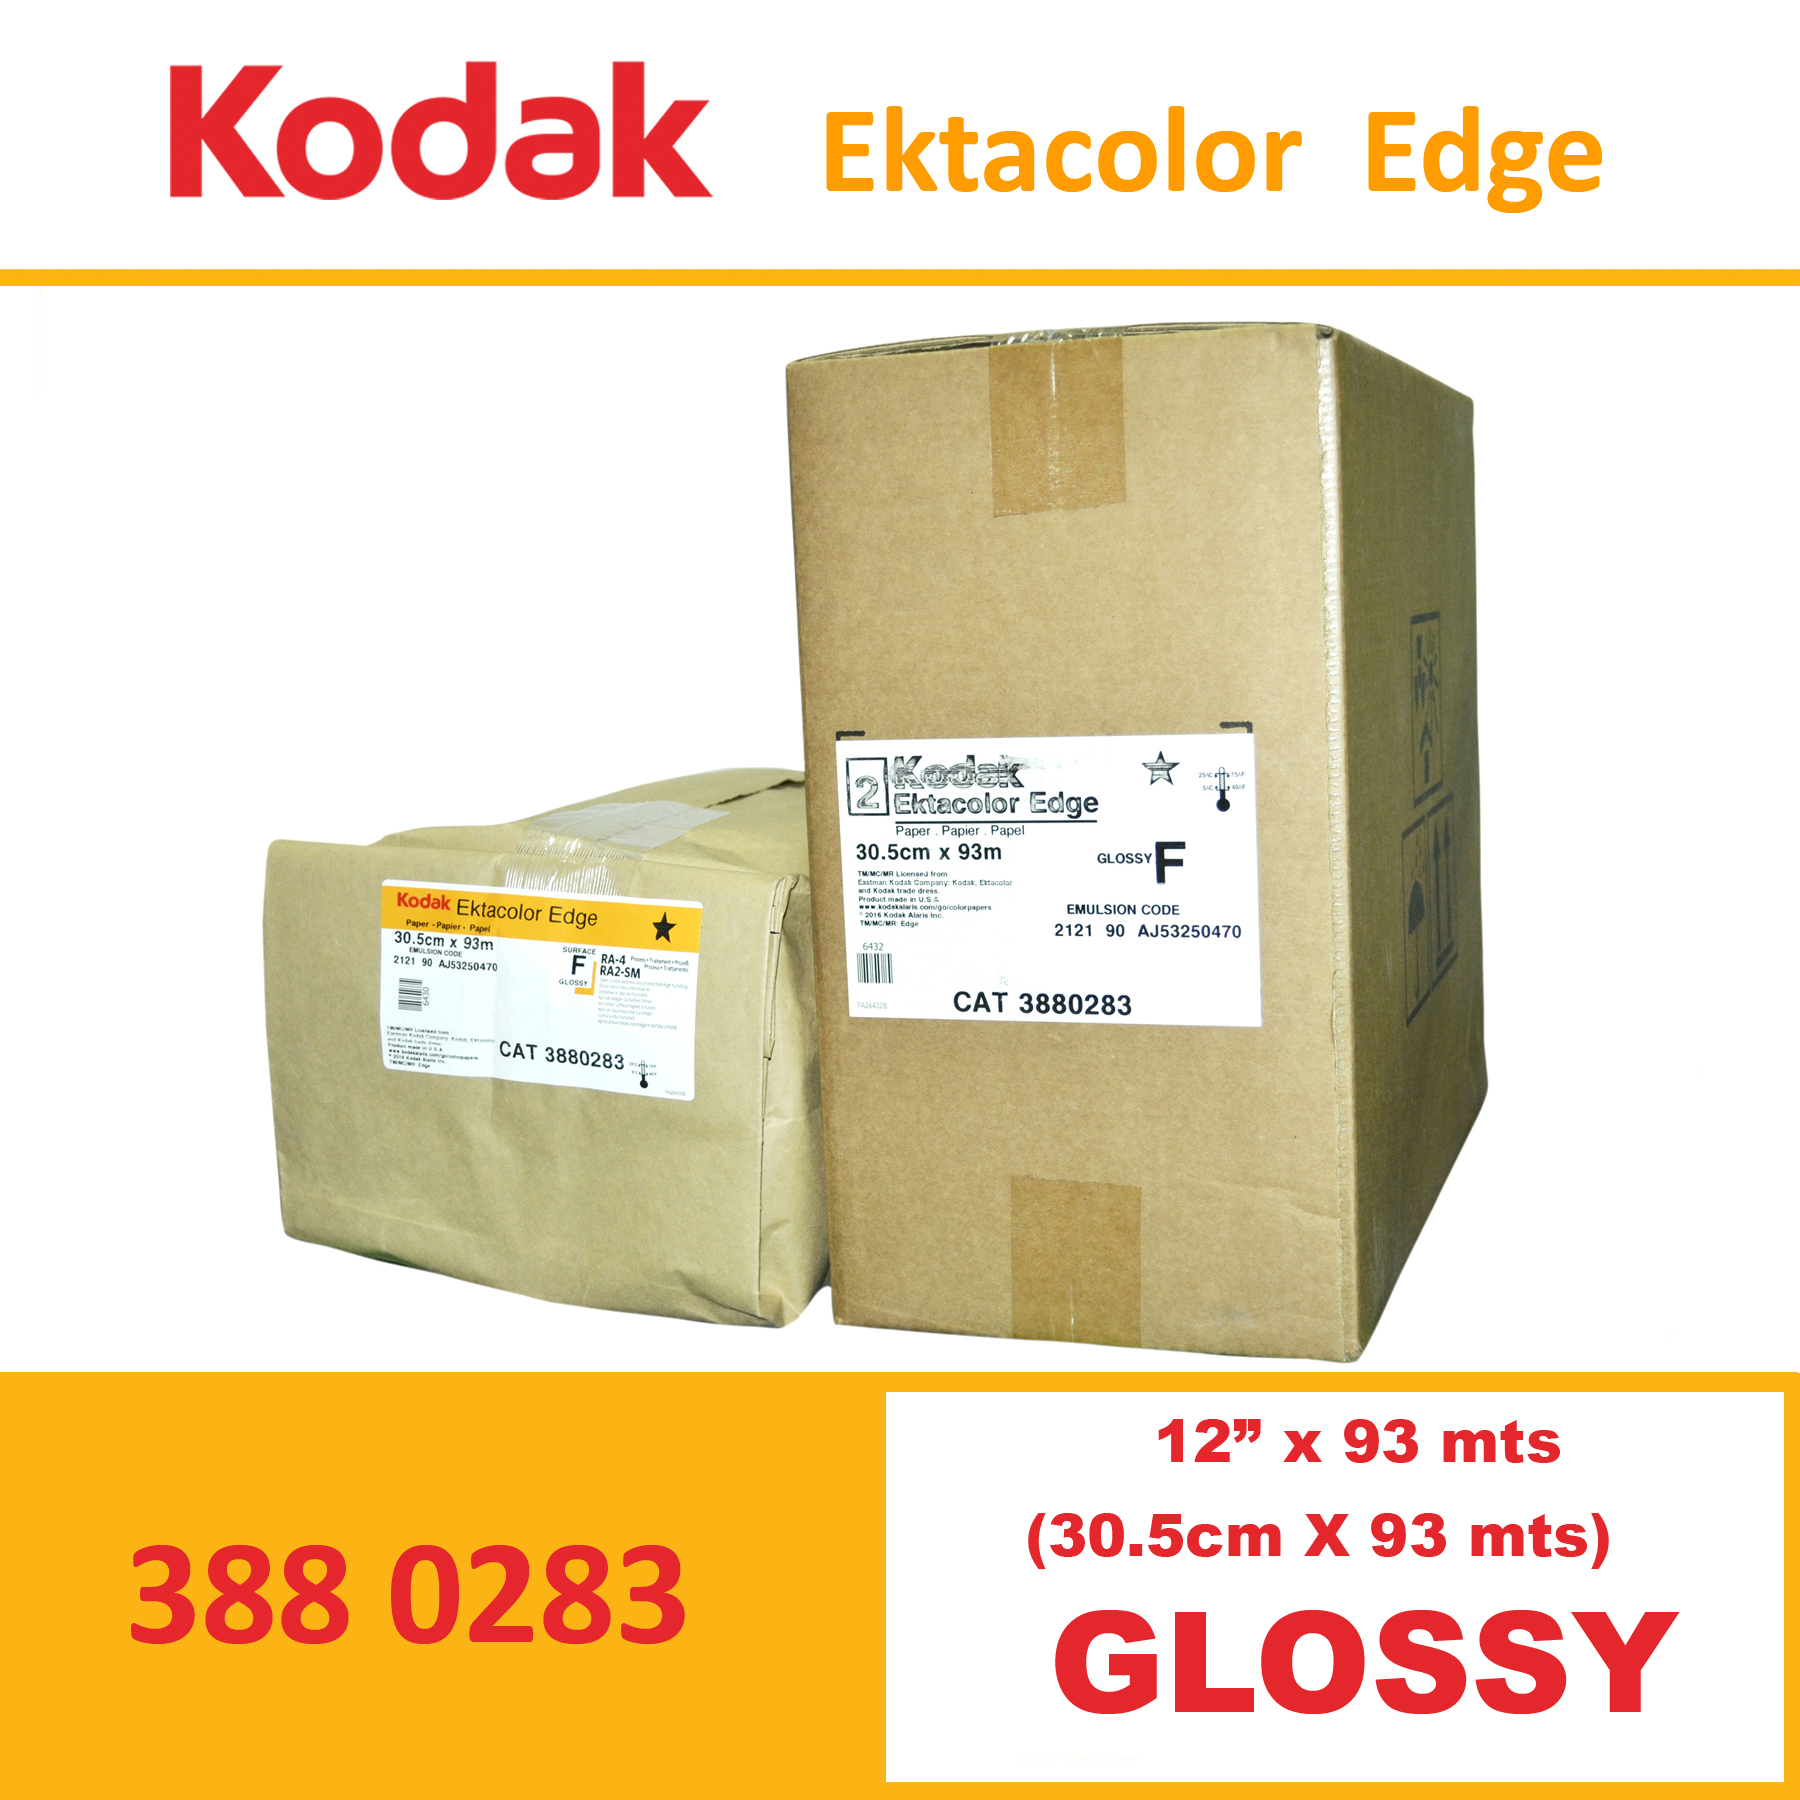 "Kodak 12"" Ekta Color Edge Paper Glossy"